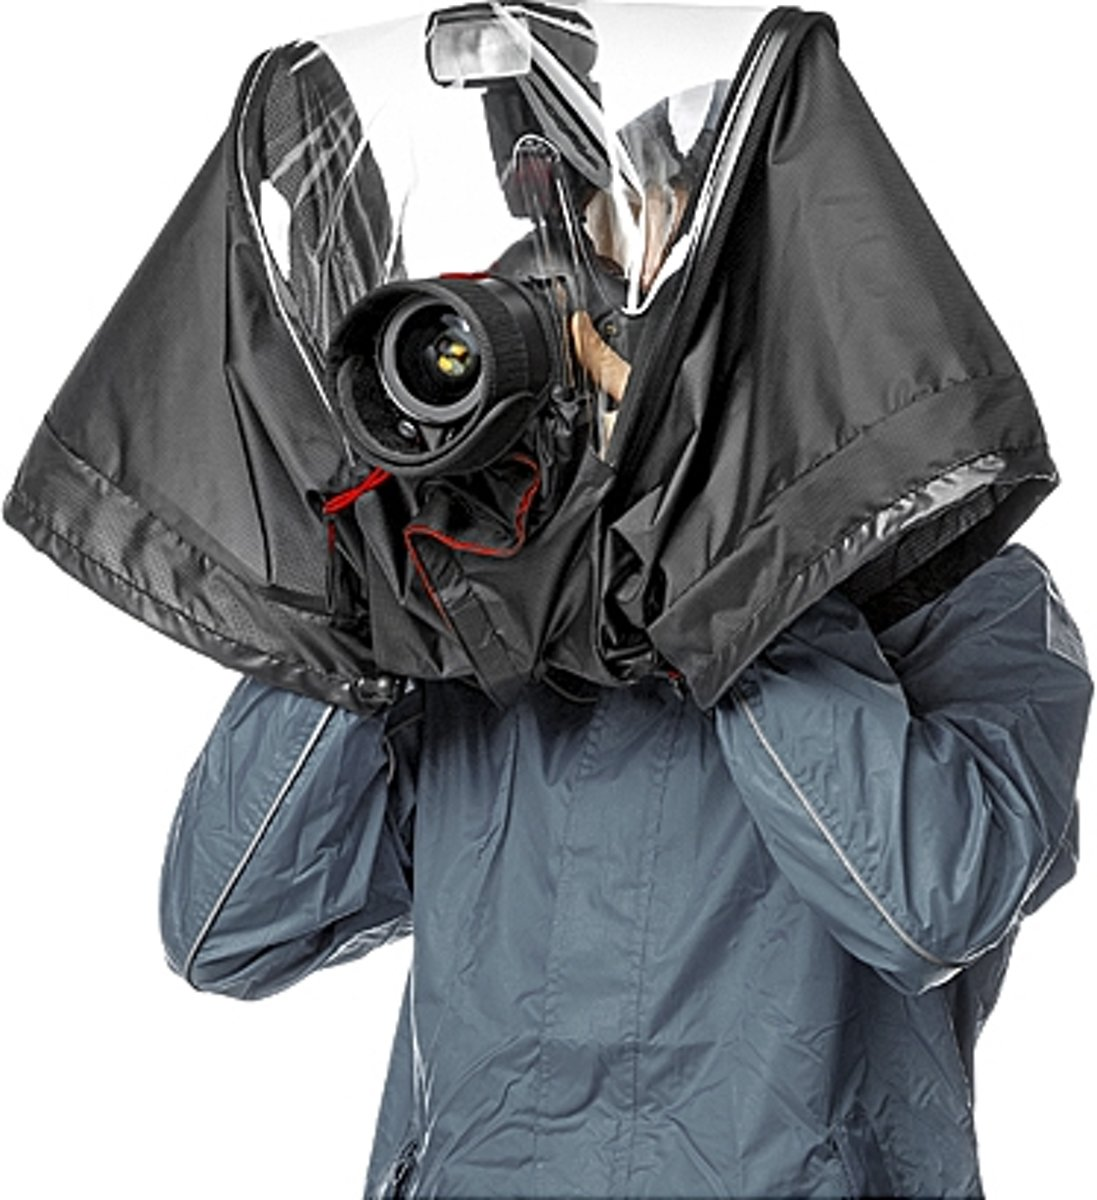 Manfrotto Mb Pl E 705 Dslr Camera Stof Weefsel Regenhoes Ma H M Holster Voor